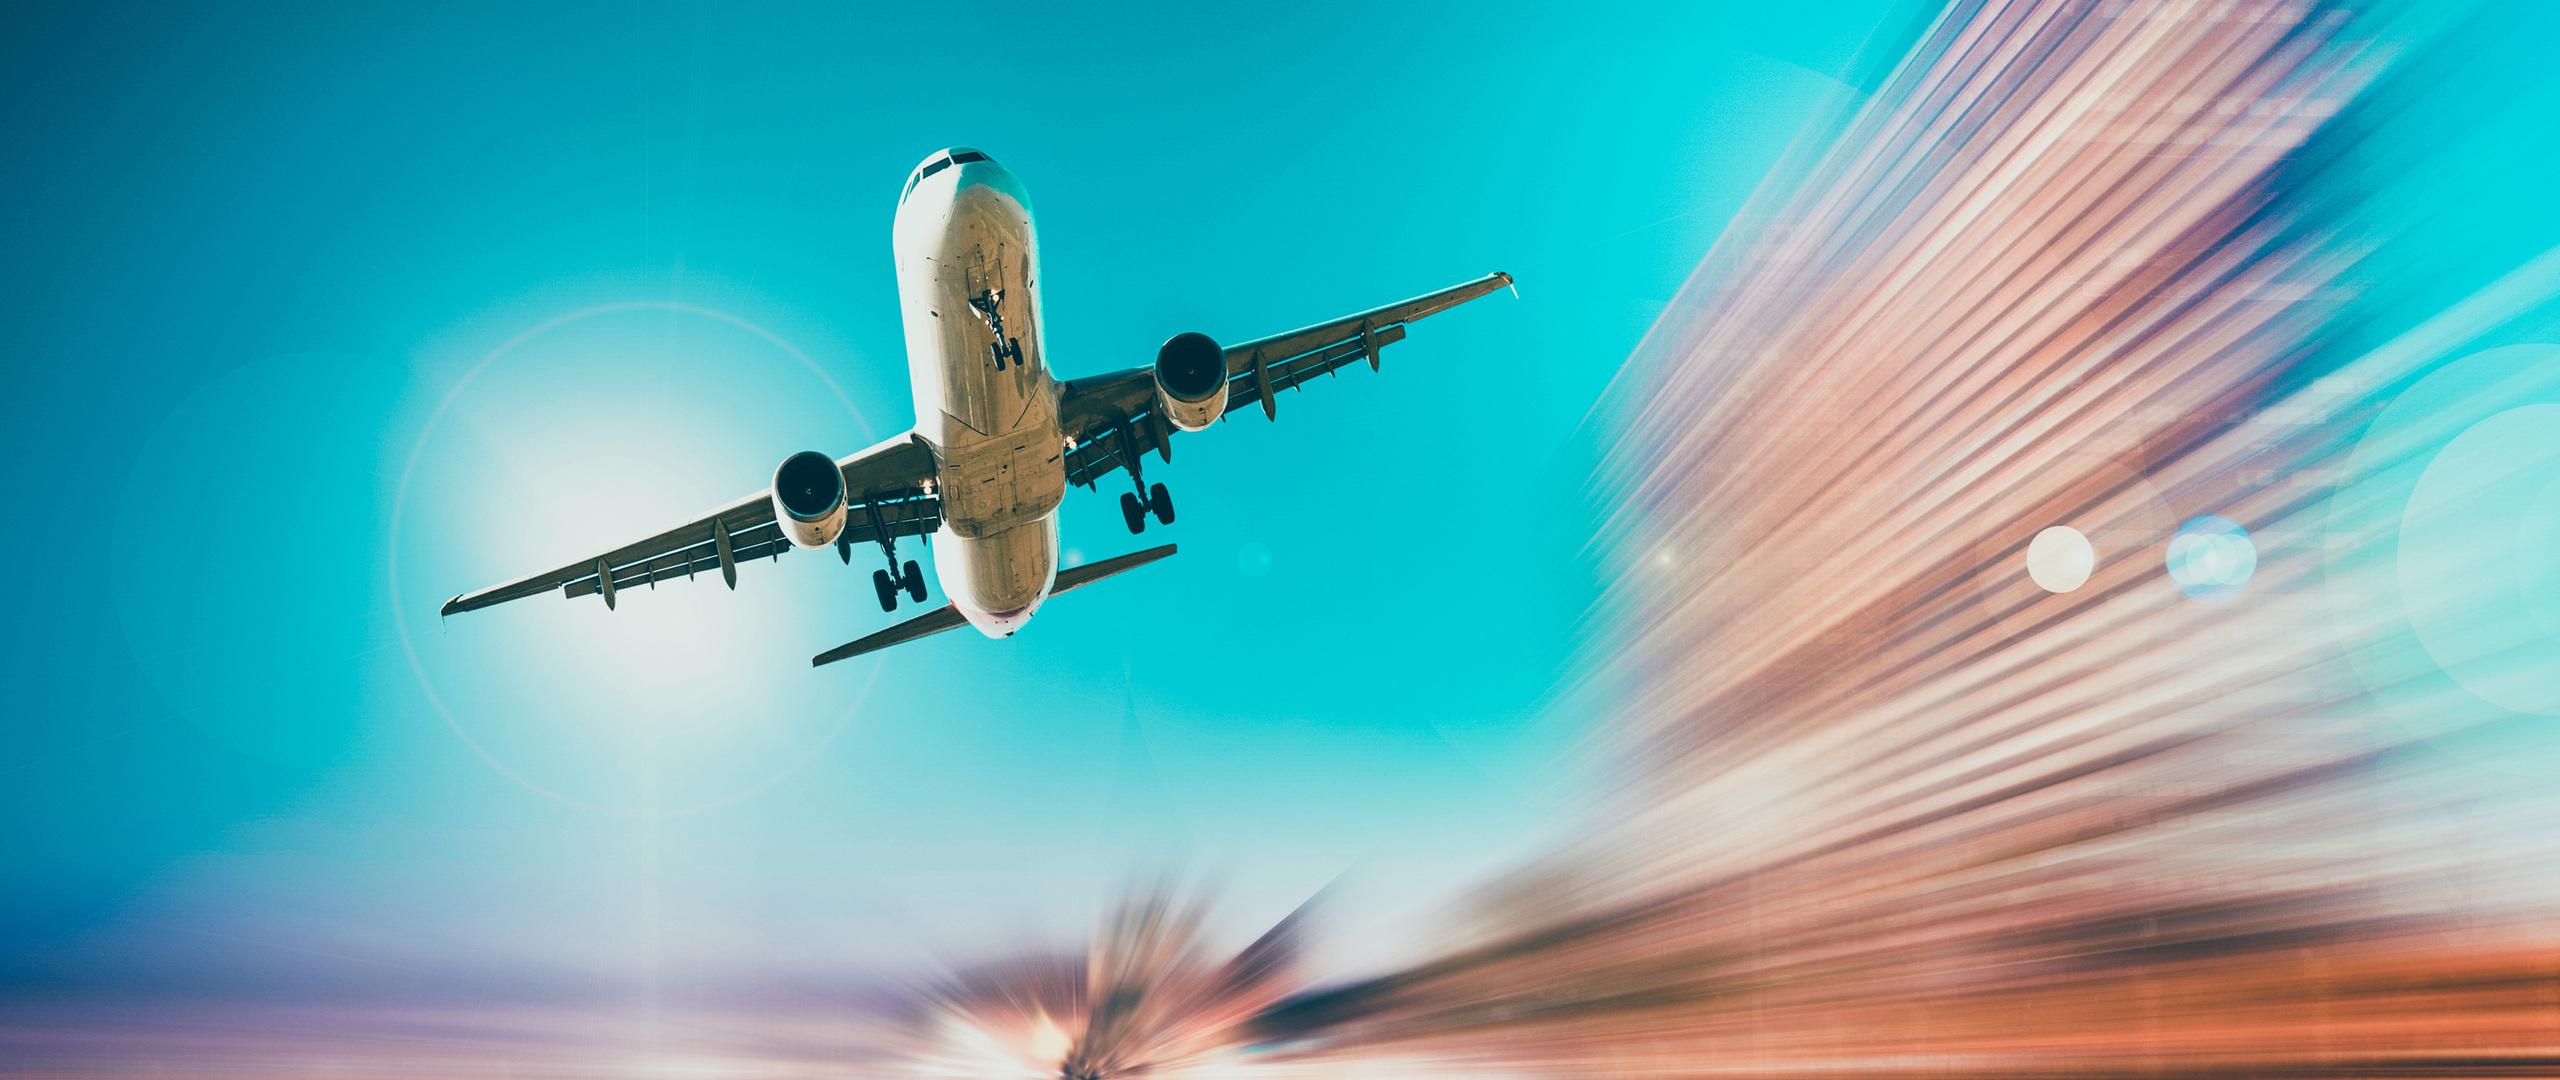 airplane-5k-u5.jpg